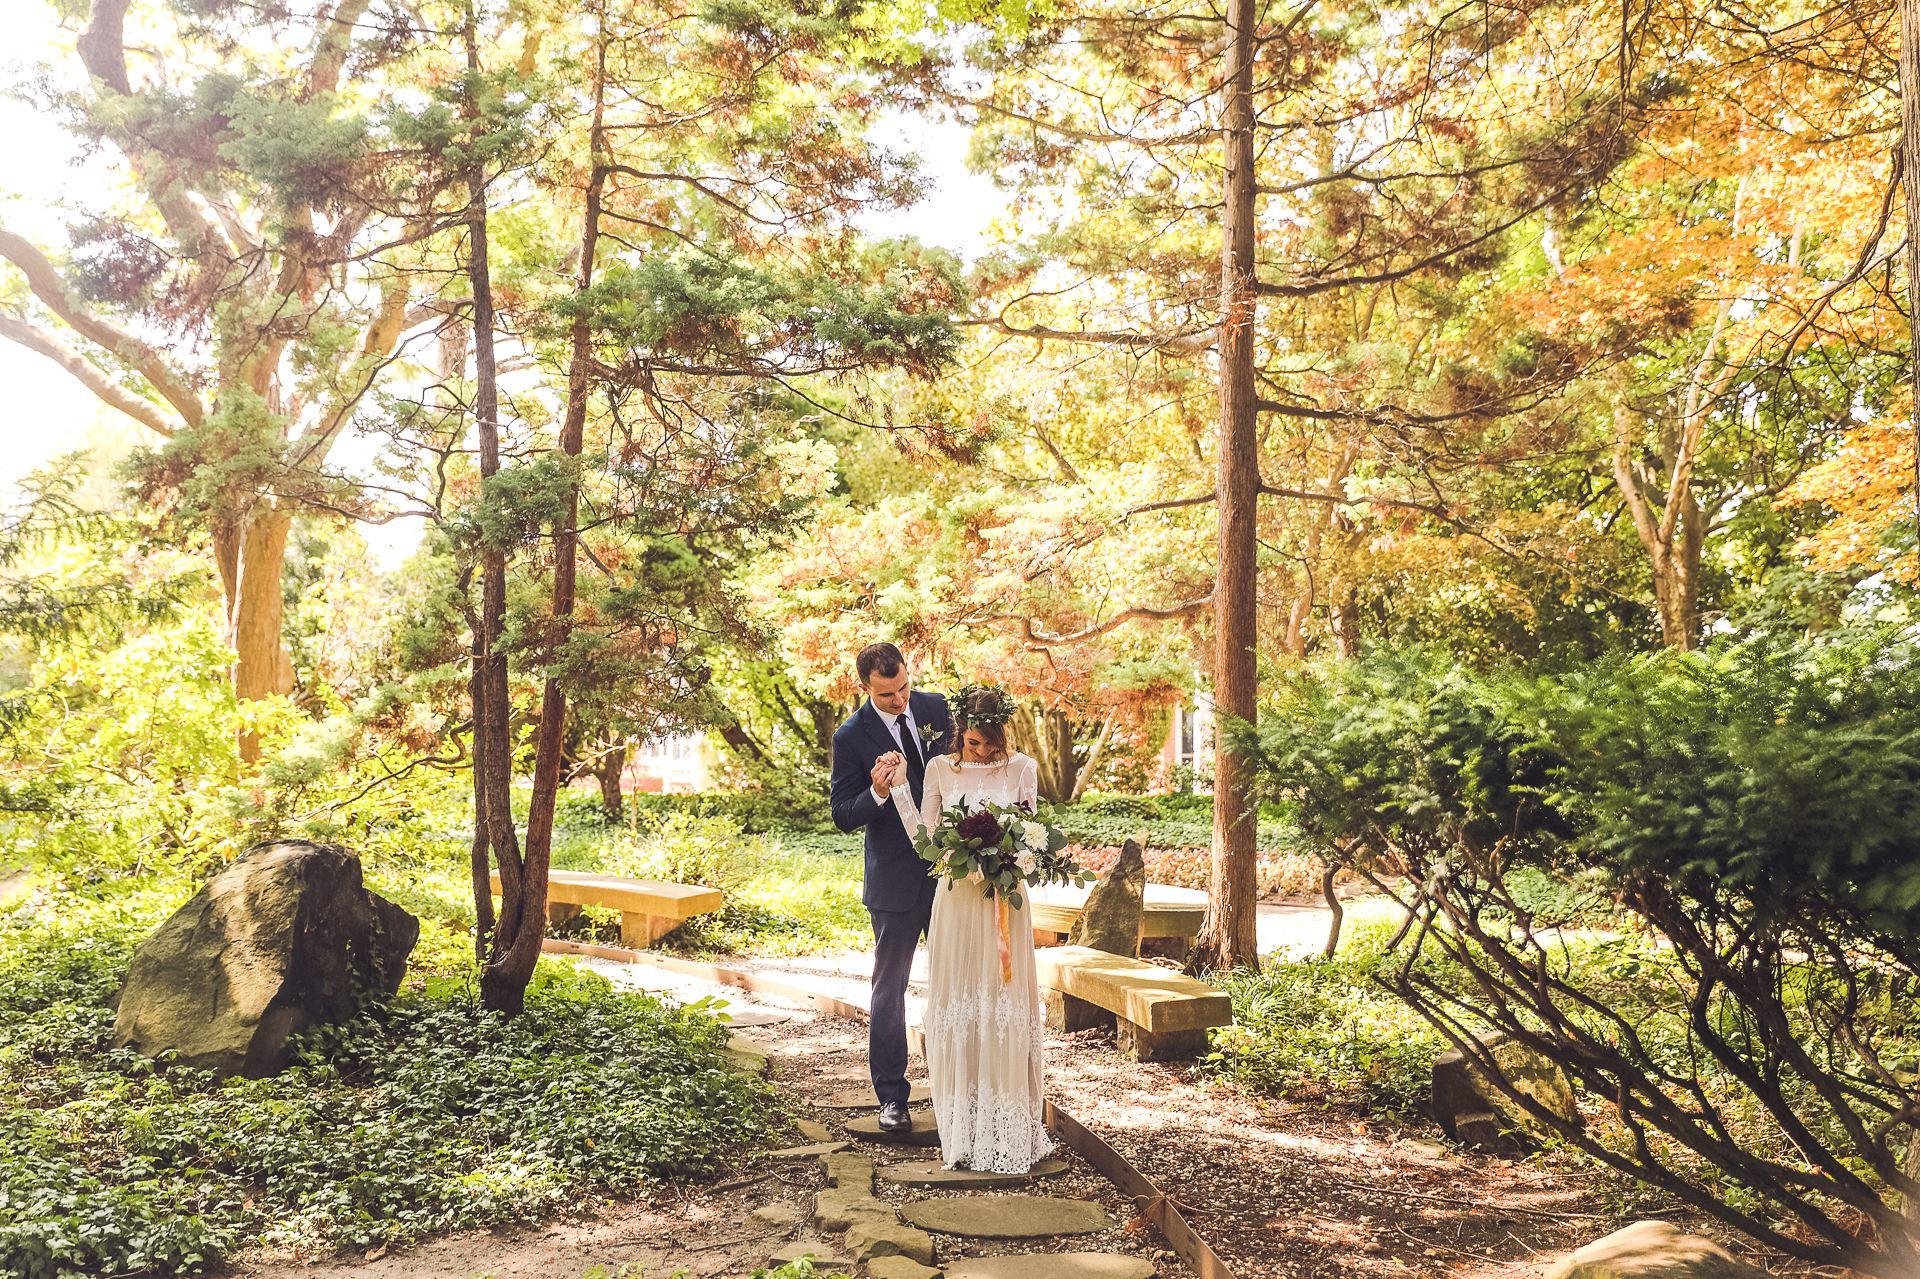 Ariel International Center Wedding Photographer in Cleveland 6.jpg